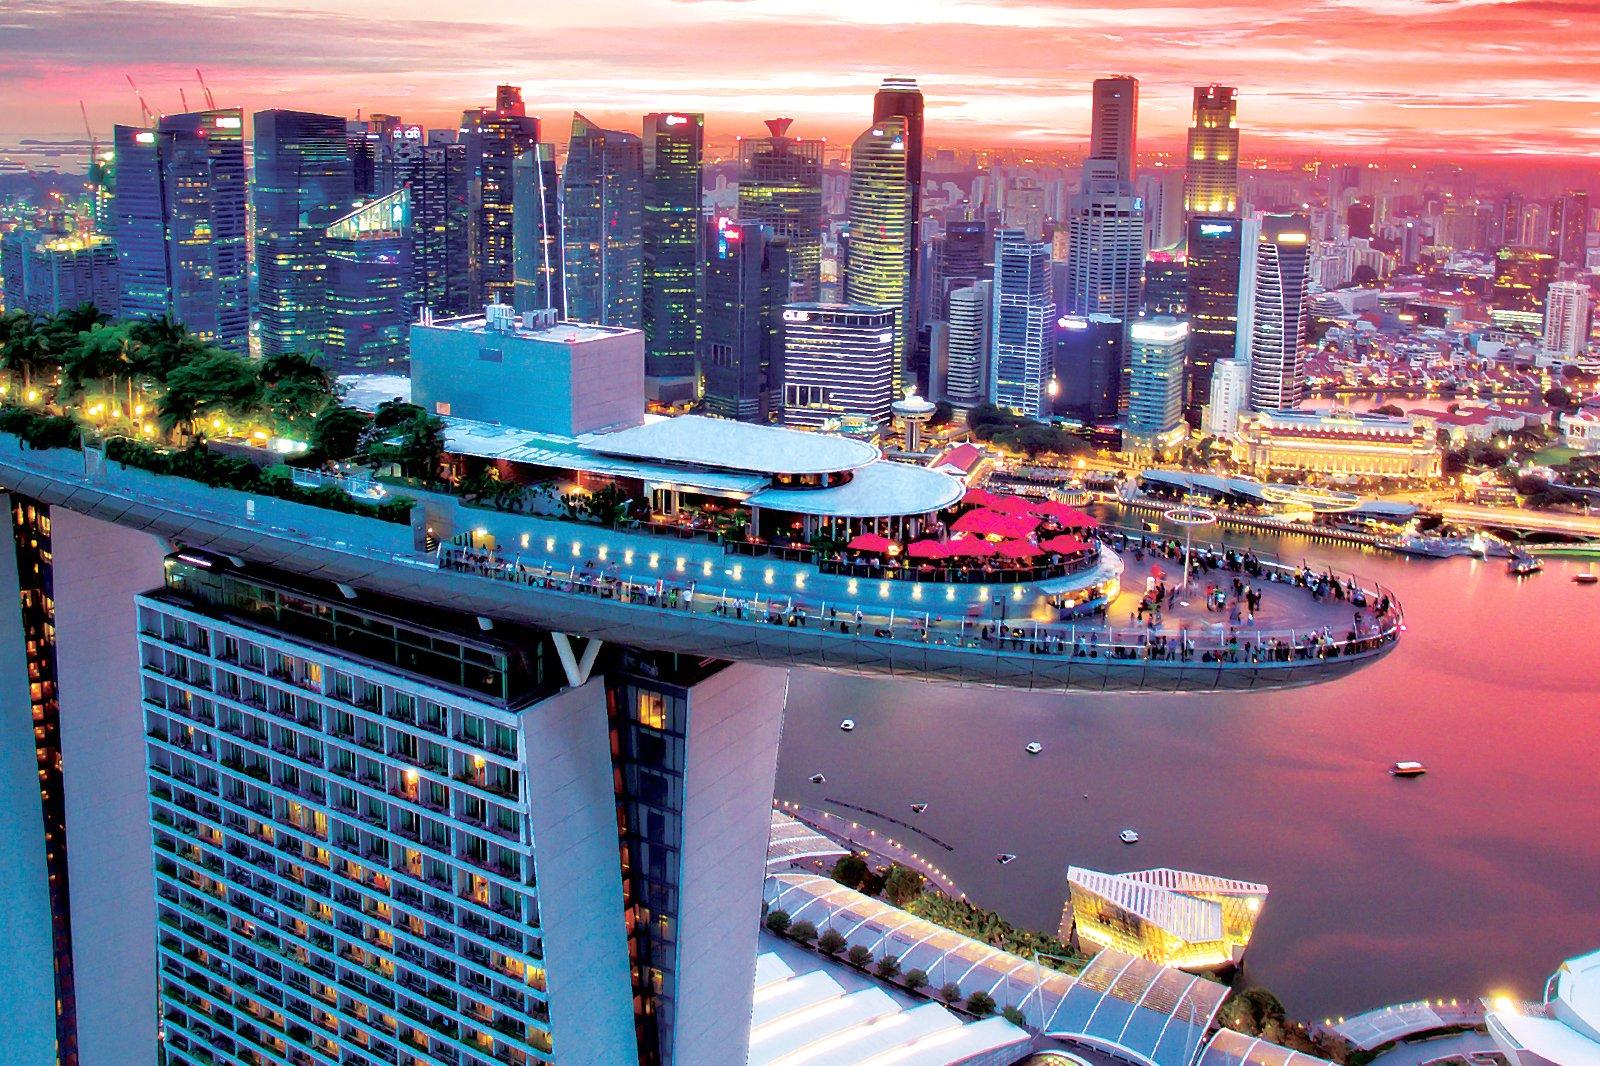 CE LA VI Singapore - Rooftop Bar at Marina Bay Sands